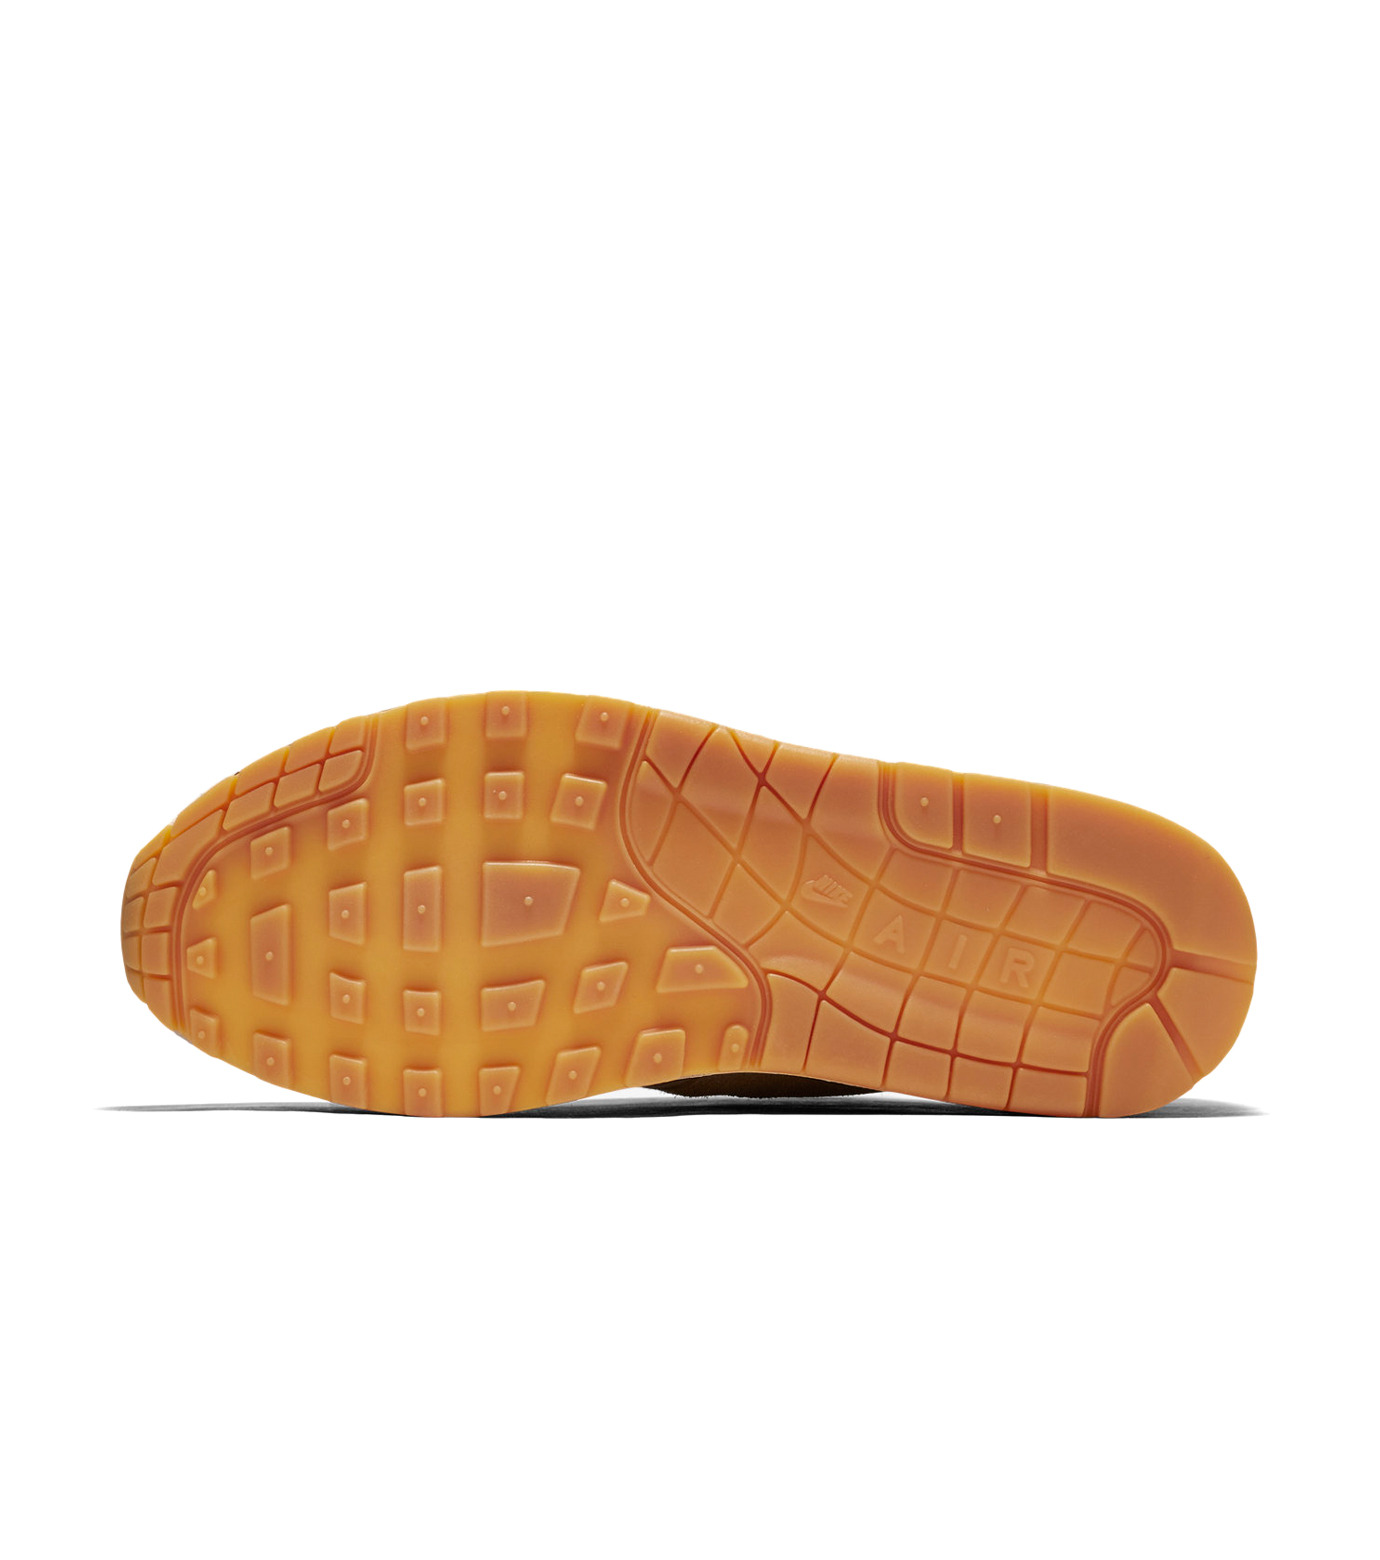 NIKE(ナイキ)のAIR MAX 1 Pinnacle-GRAY(シューズ/shoes)-839608-200-11 拡大詳細画像2